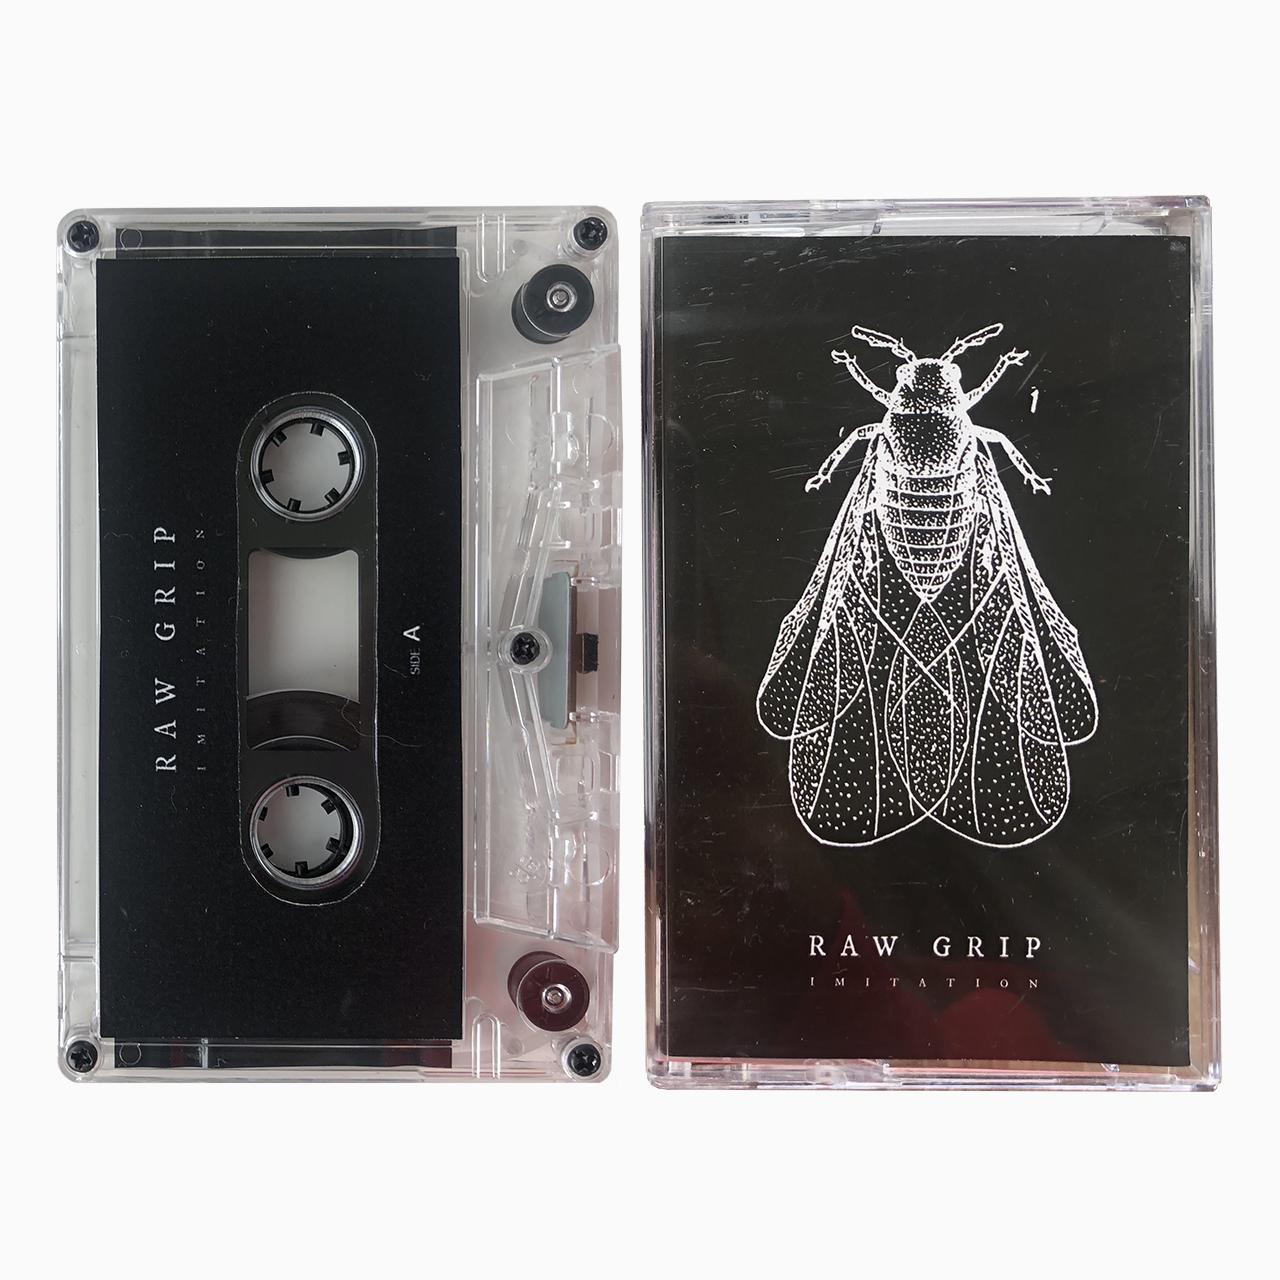 Raw Grip 'Imitation' cassette